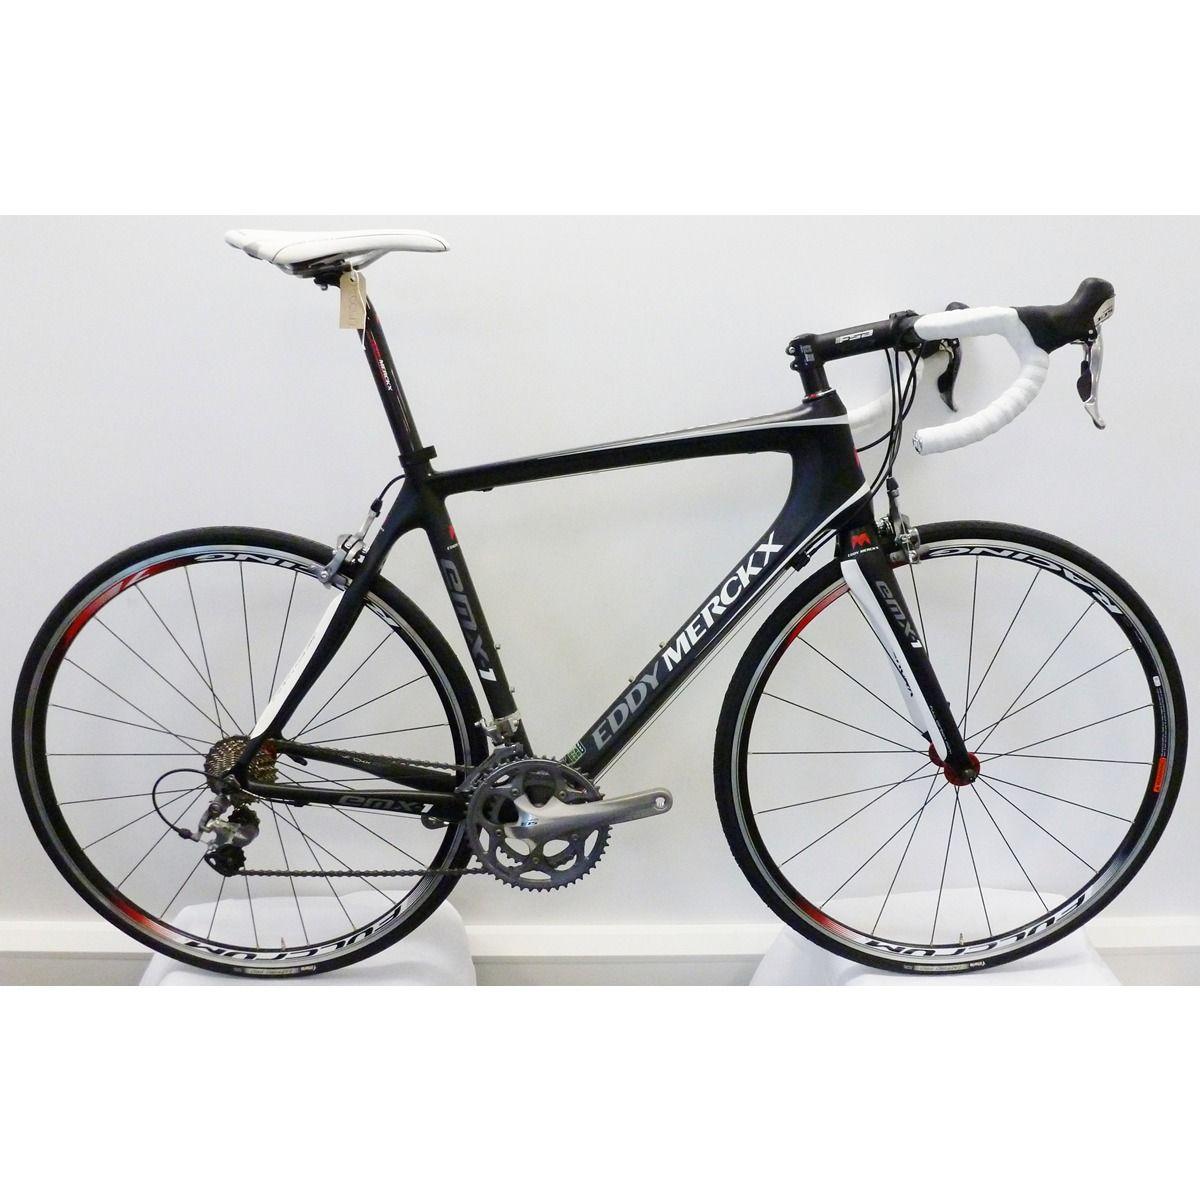 Eddy Merckx Emx 1 Shimano 105 5700 Eddy Merckx Road Bikes Merlin Cycles Merlin Cycles Bike Road Bikes